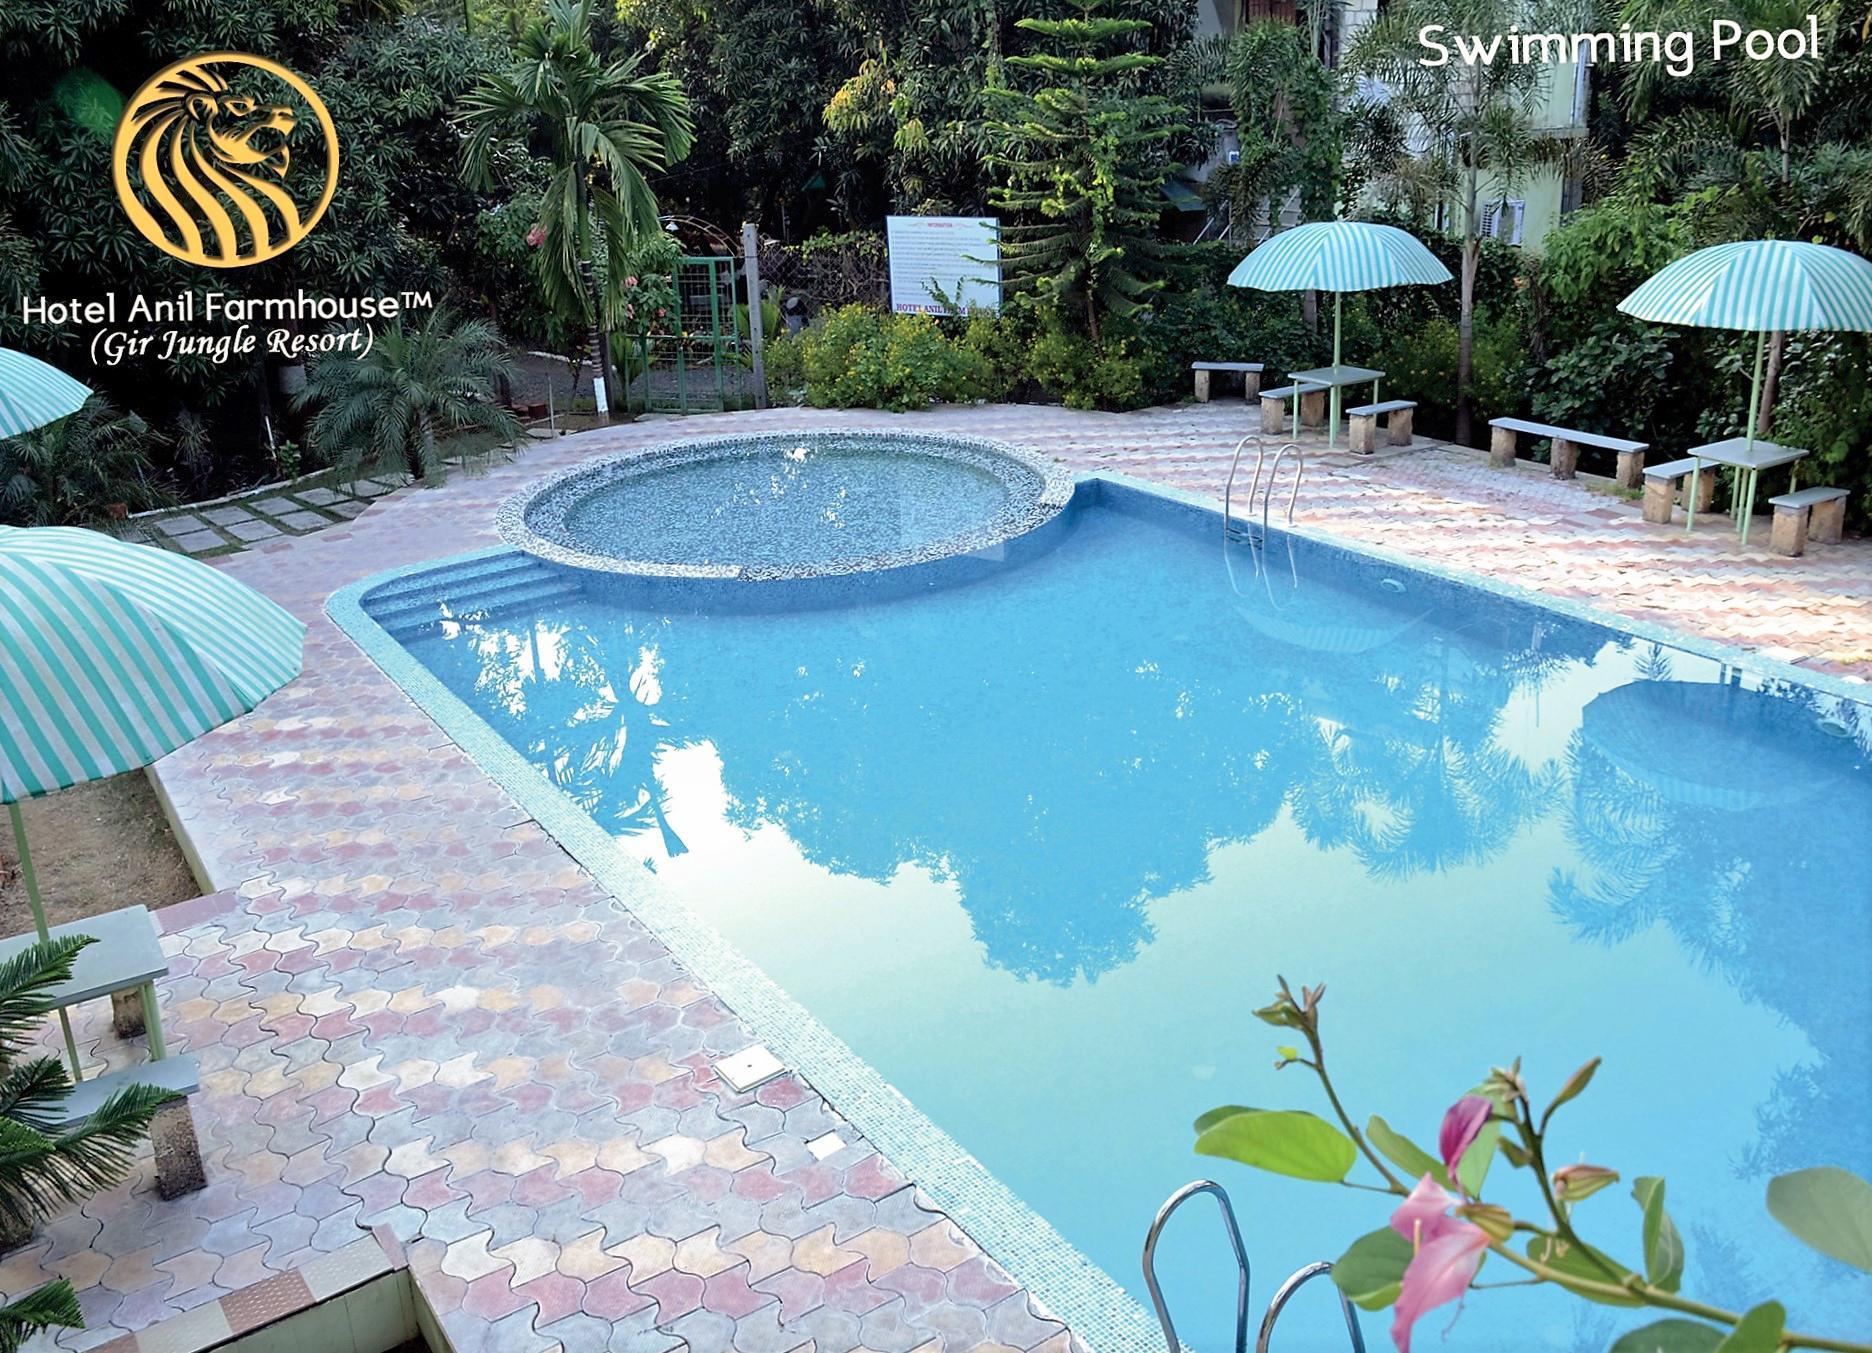 Hotel Anil Farmhouse   Gir Jungle Resort